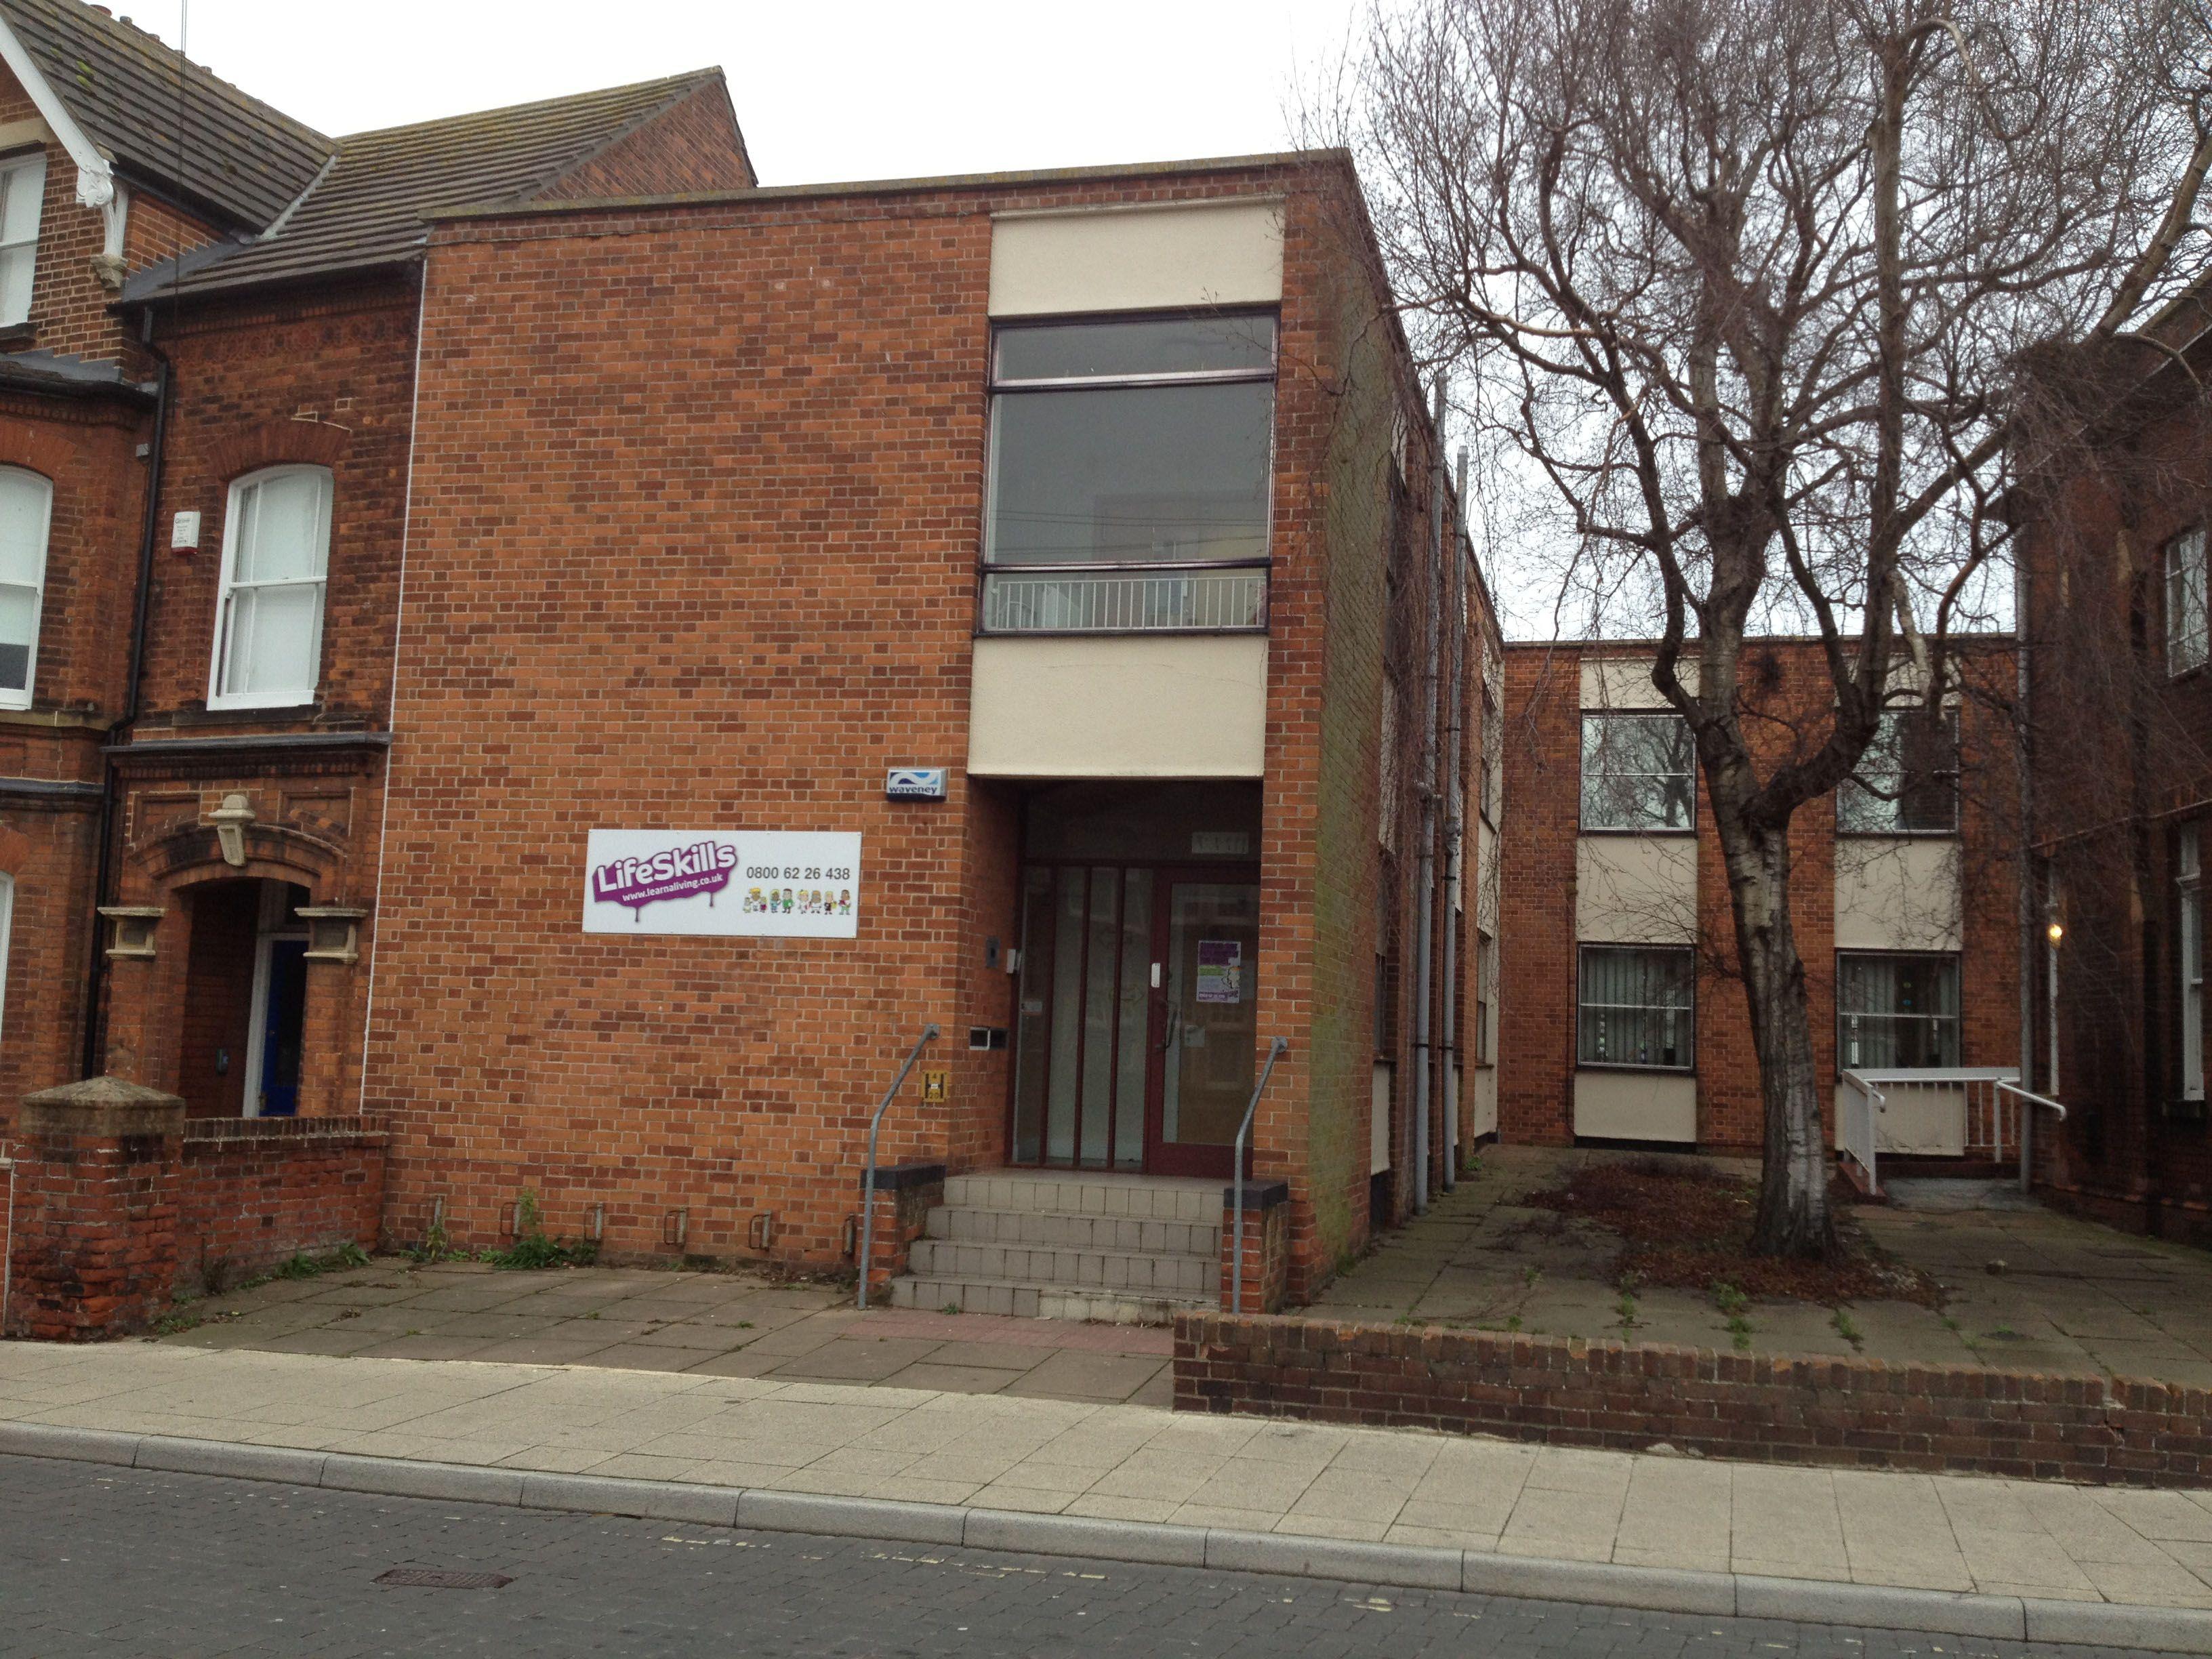 Lifeskills Lowestoft 28 Gordon Road Lowestoft Suffolk Nr32 1nl Tel